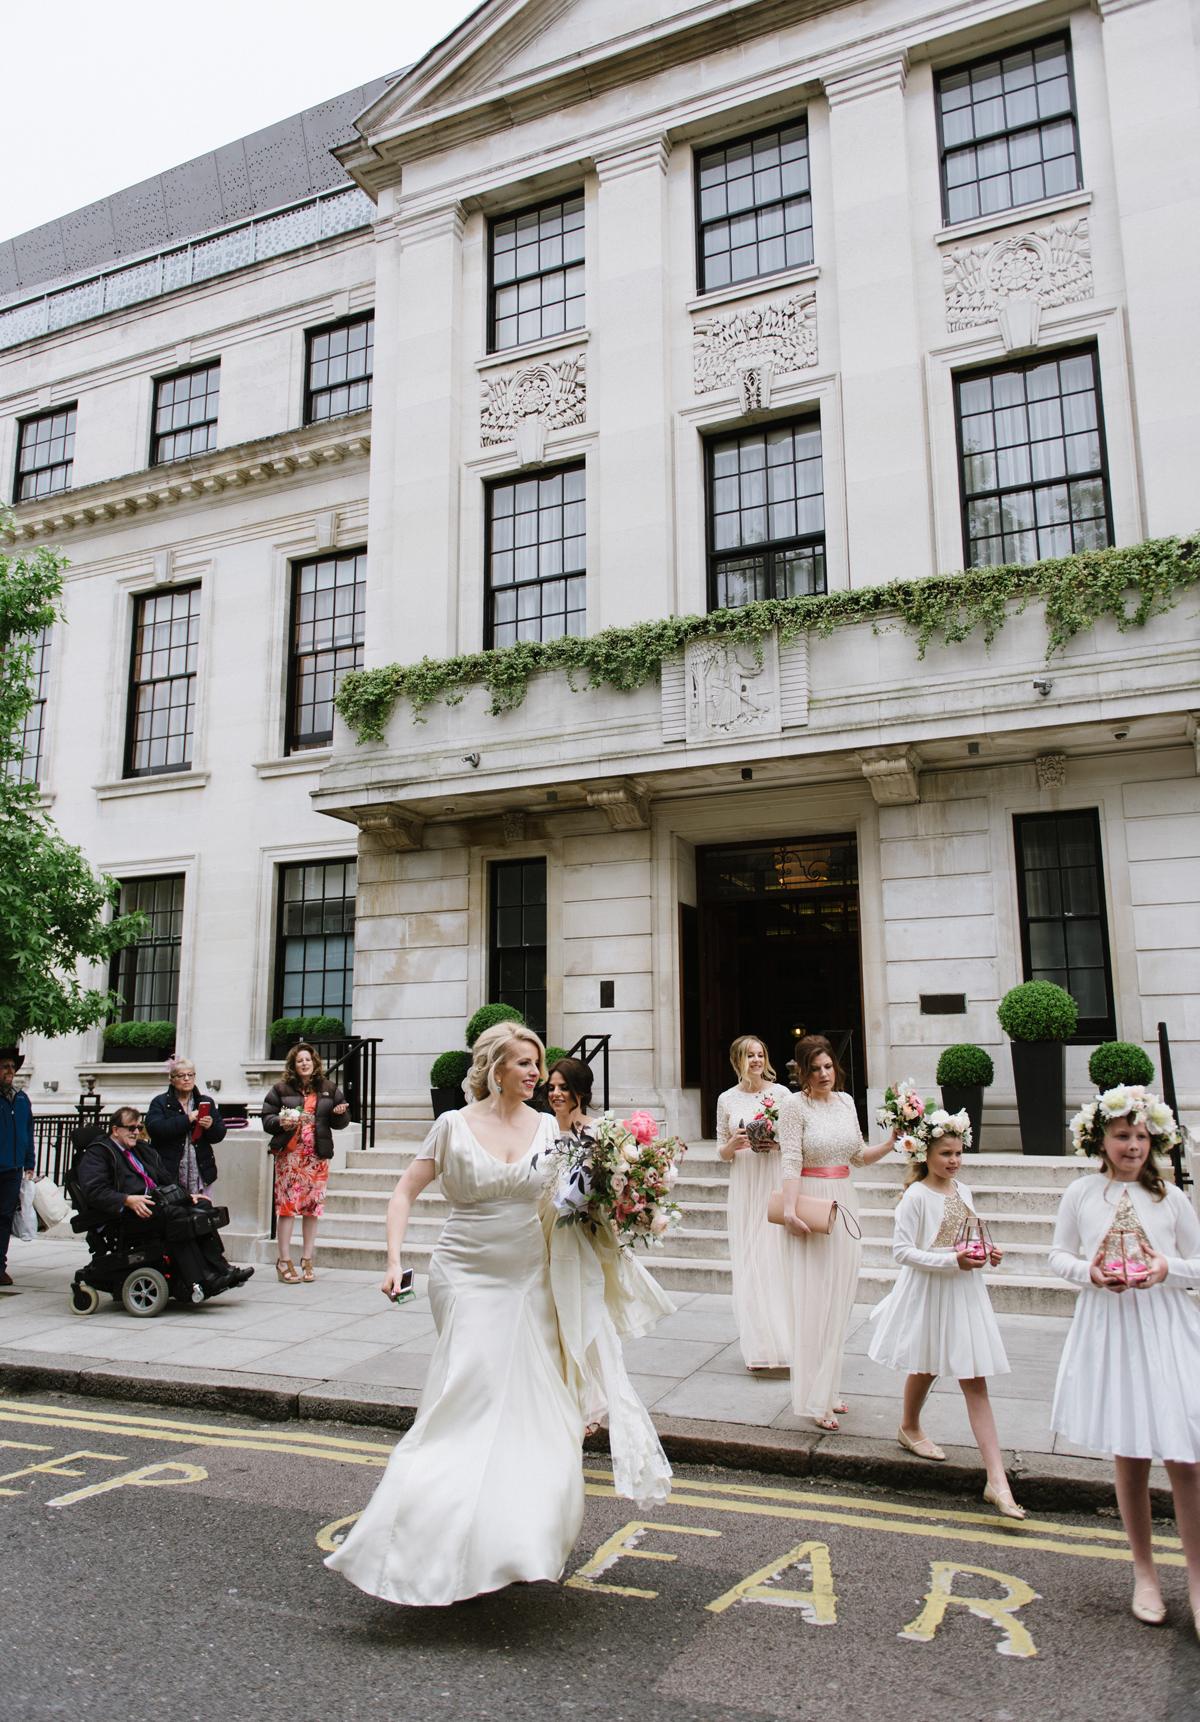 Cheryl_and_Alec_wedding-210